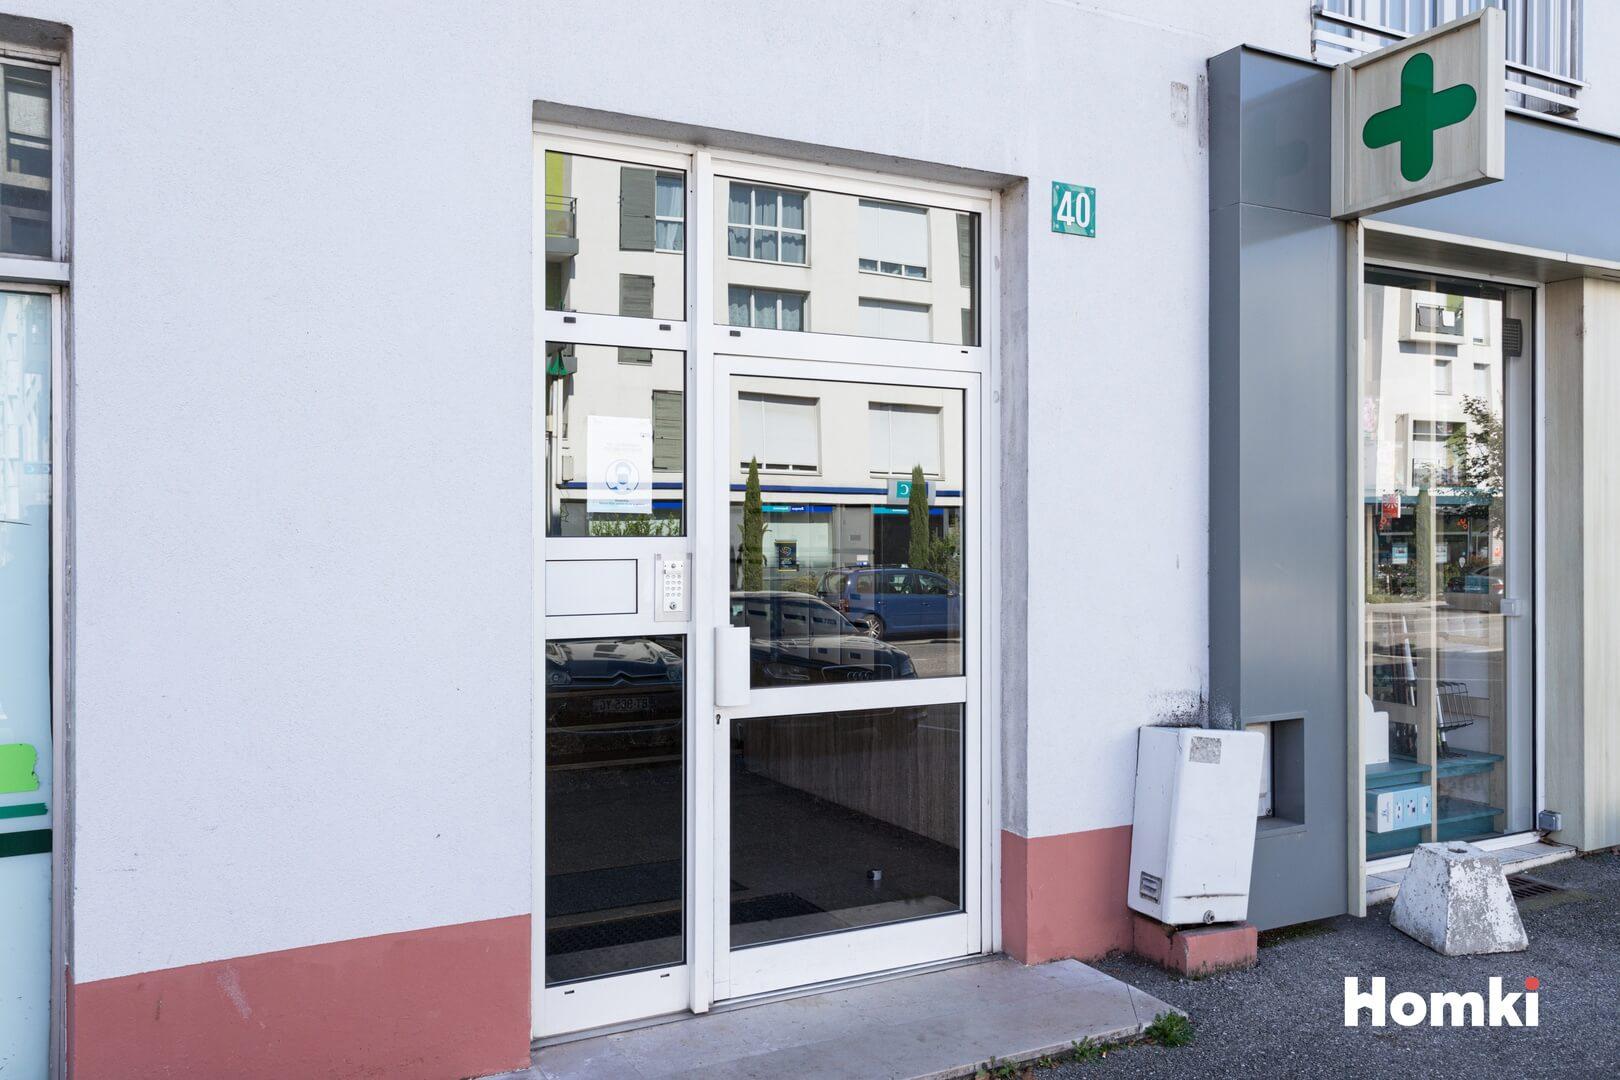 Homki - Vente Appartement  de 56.0 m² à Meyzieu 69330